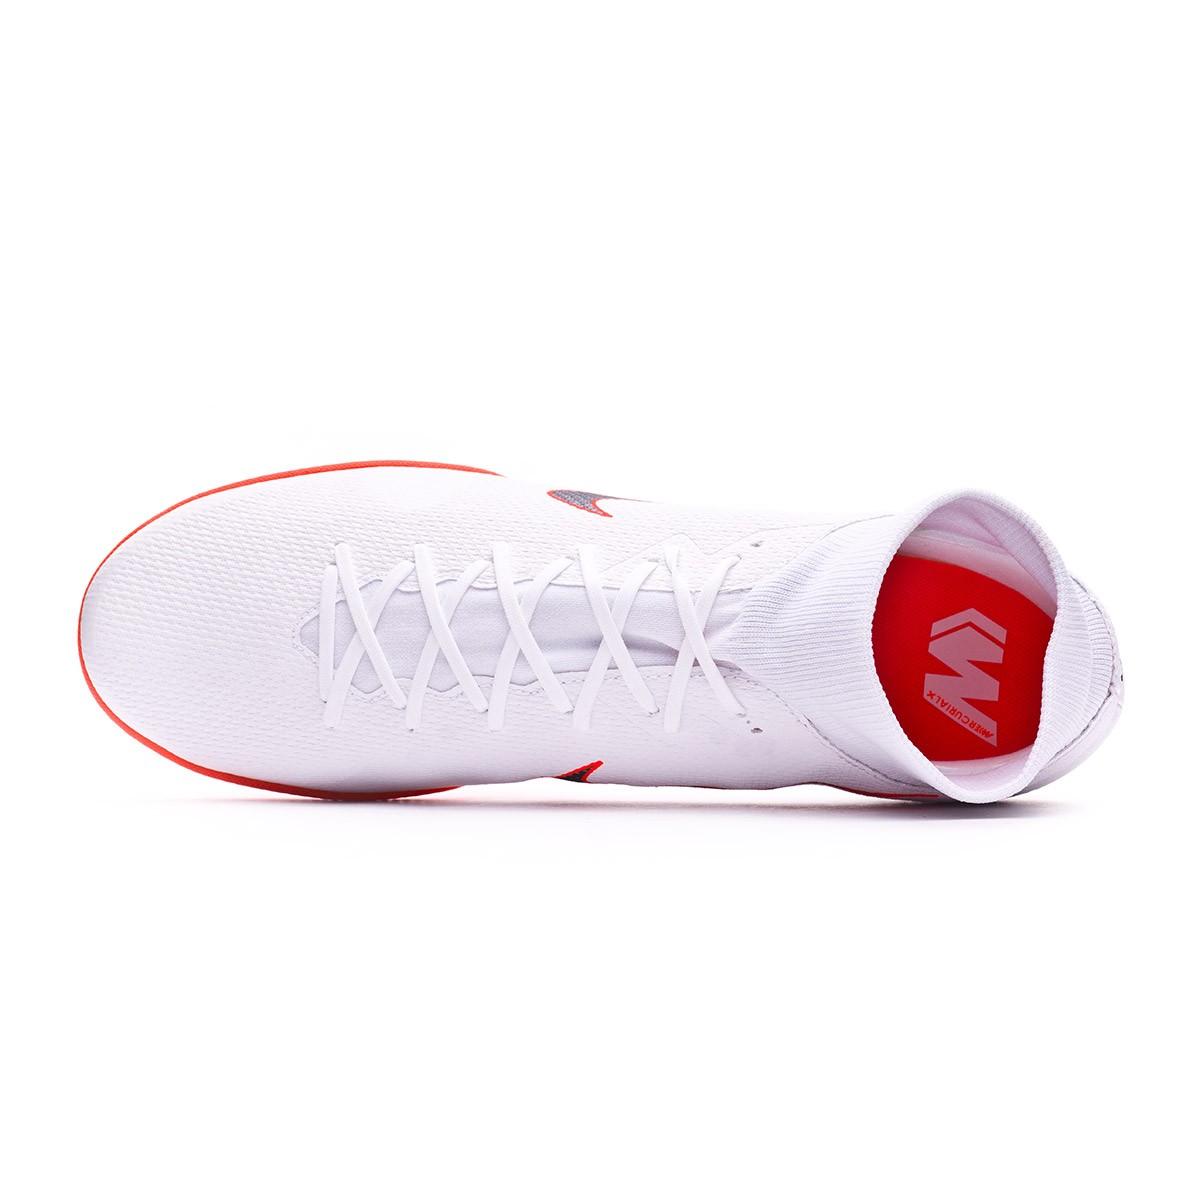 9a1f18aeebc5 Futsal Boot Nike Mercurial SuperflyX VI Academy IC White-Metallic cool grey-Total  orange - Tienda de fútbol Fútbol Emotion